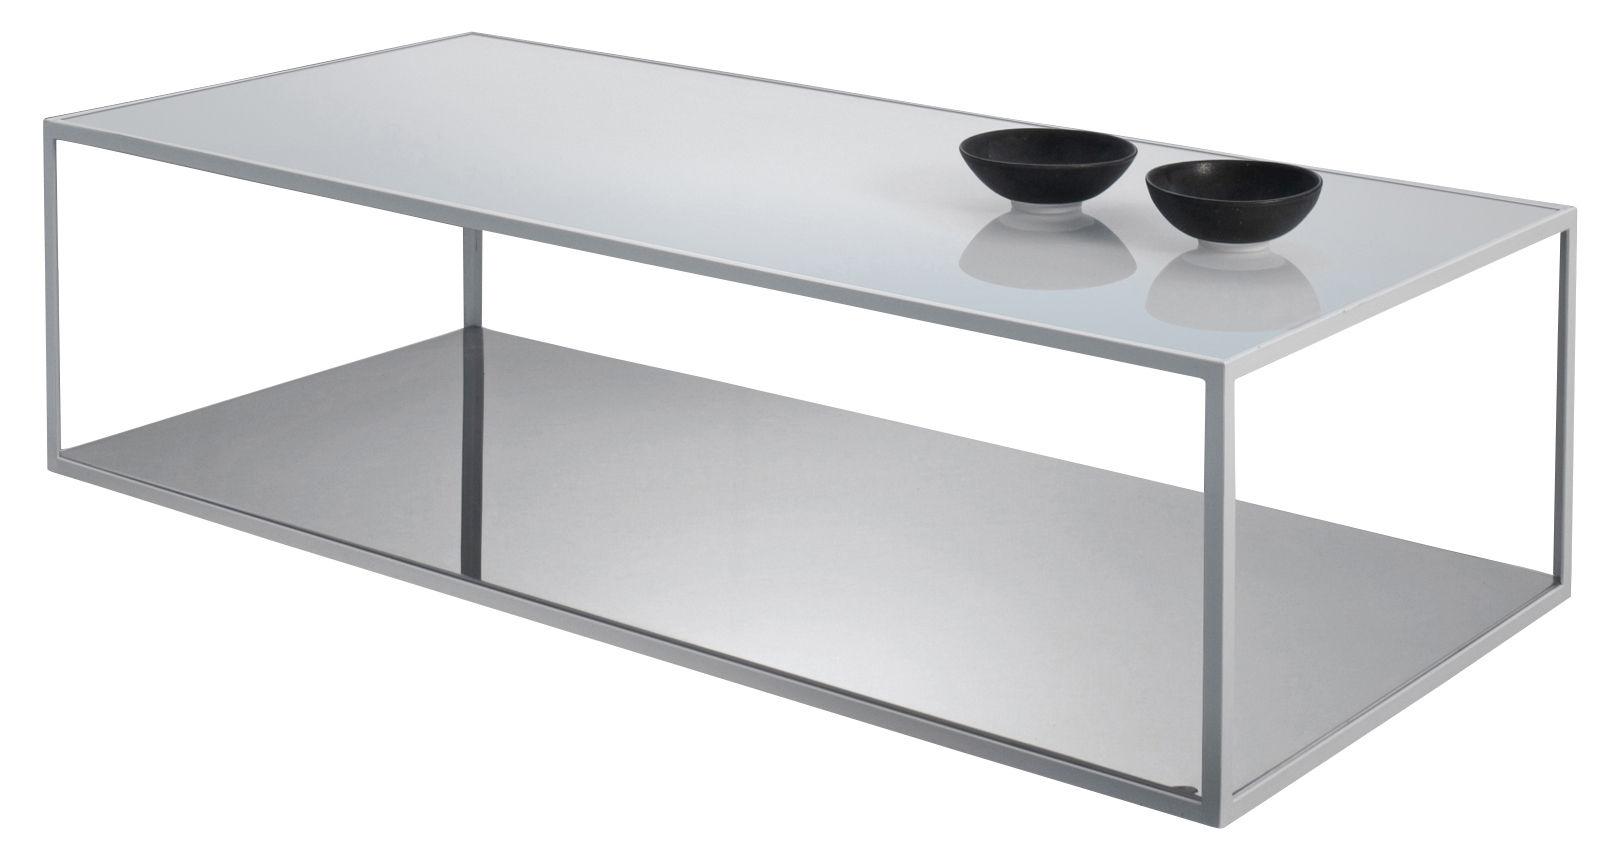 Table Basse Double Skin Verre Blanc amp Acier Inoxydable